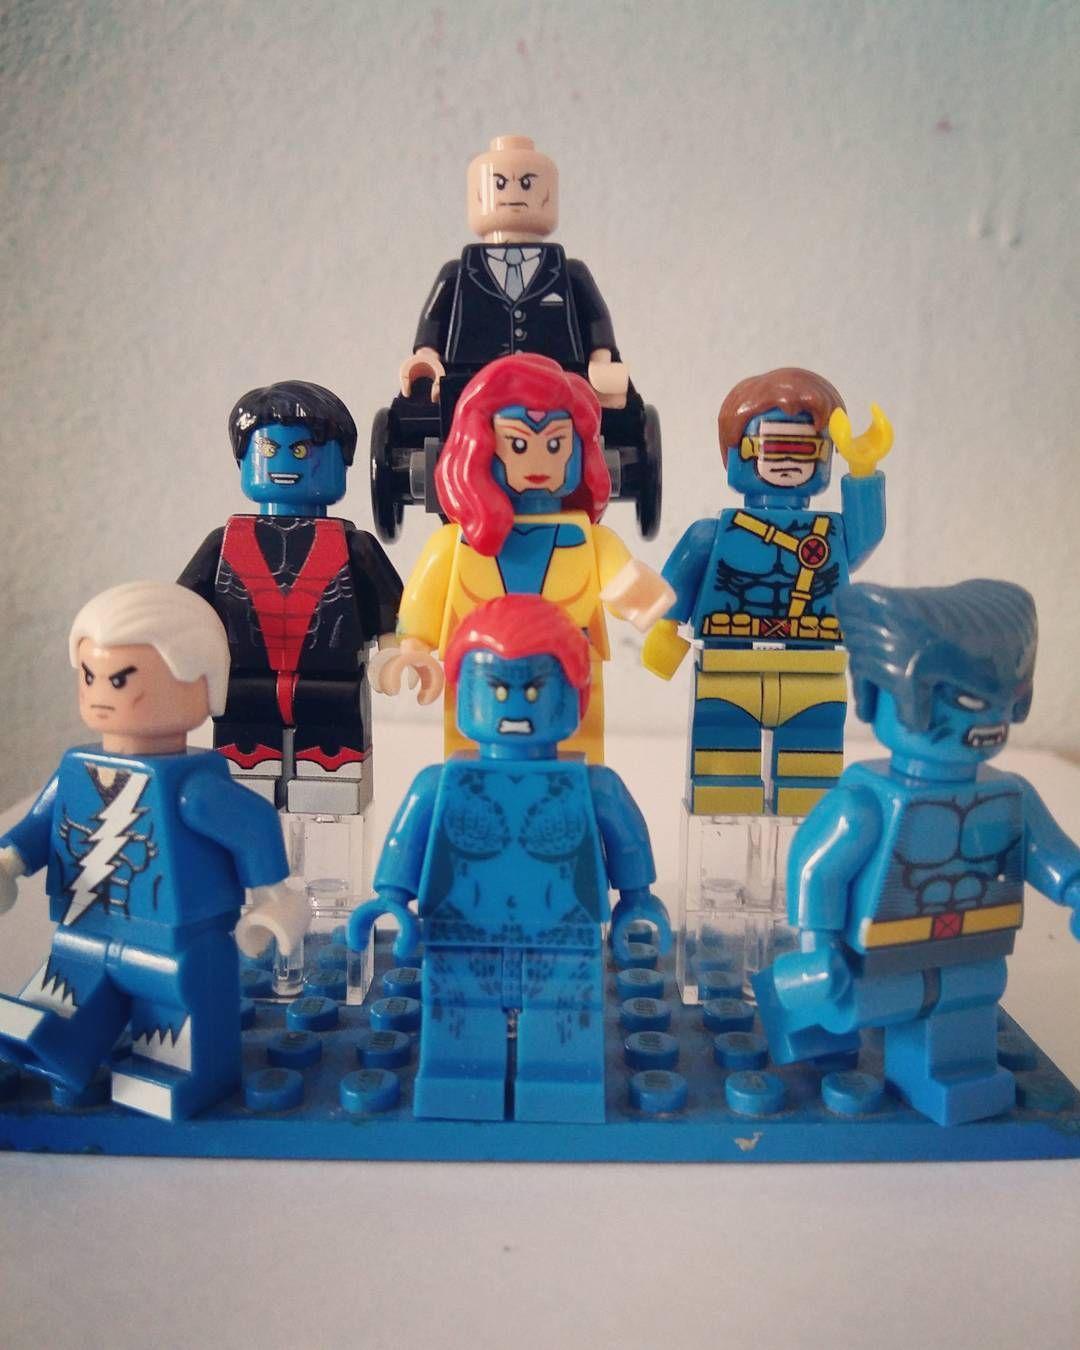 APOCALYPSE Custom Printed on Lego Minifigure!